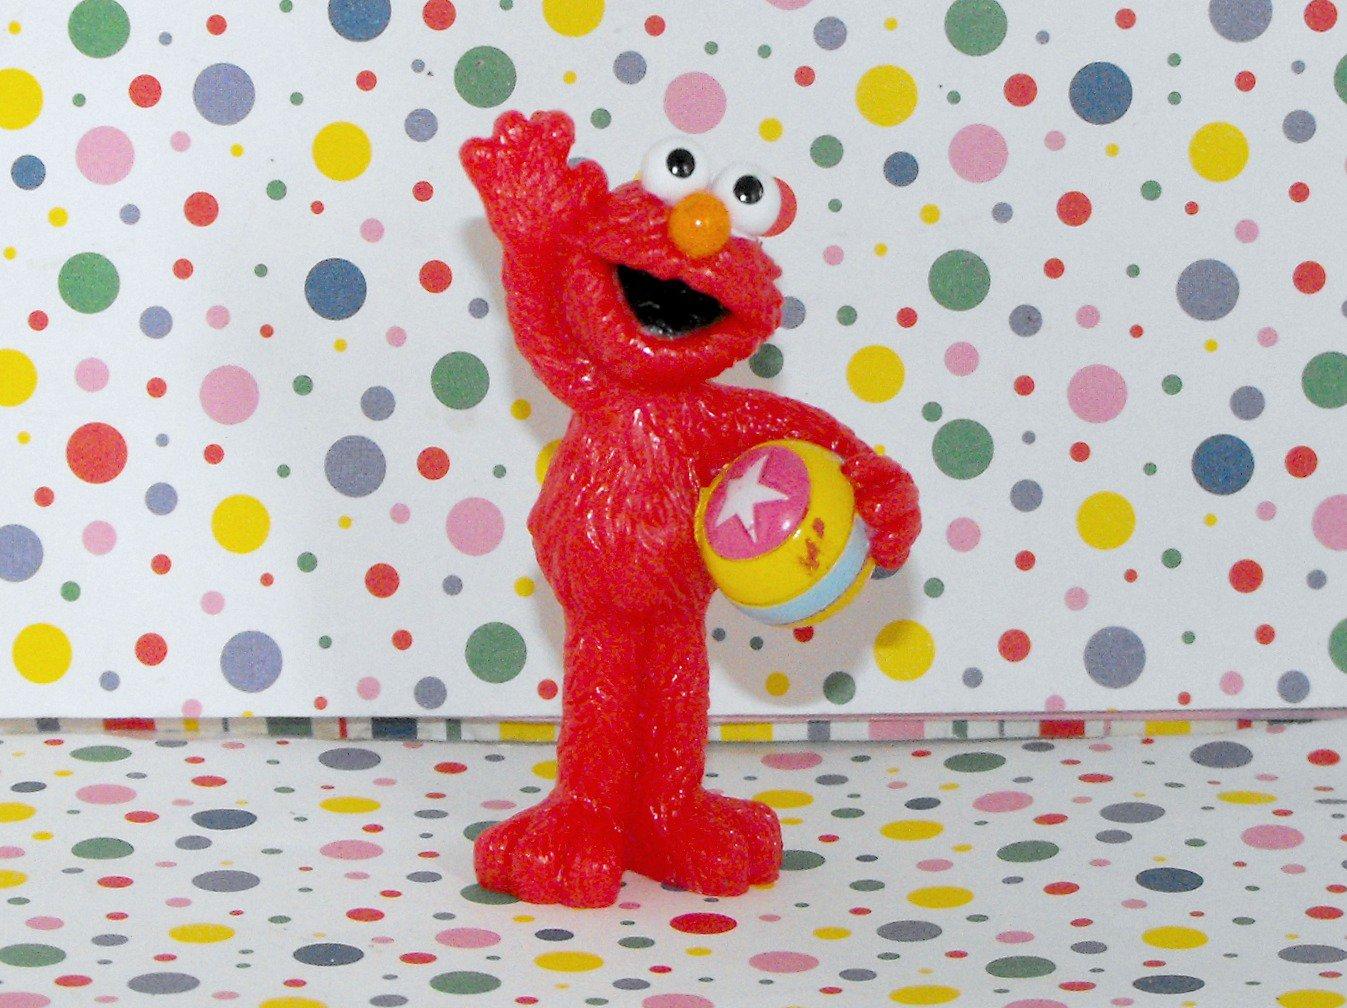 Fisher Price 1 2 3 Sesame Street Playhouse Play Set Elmo Figure